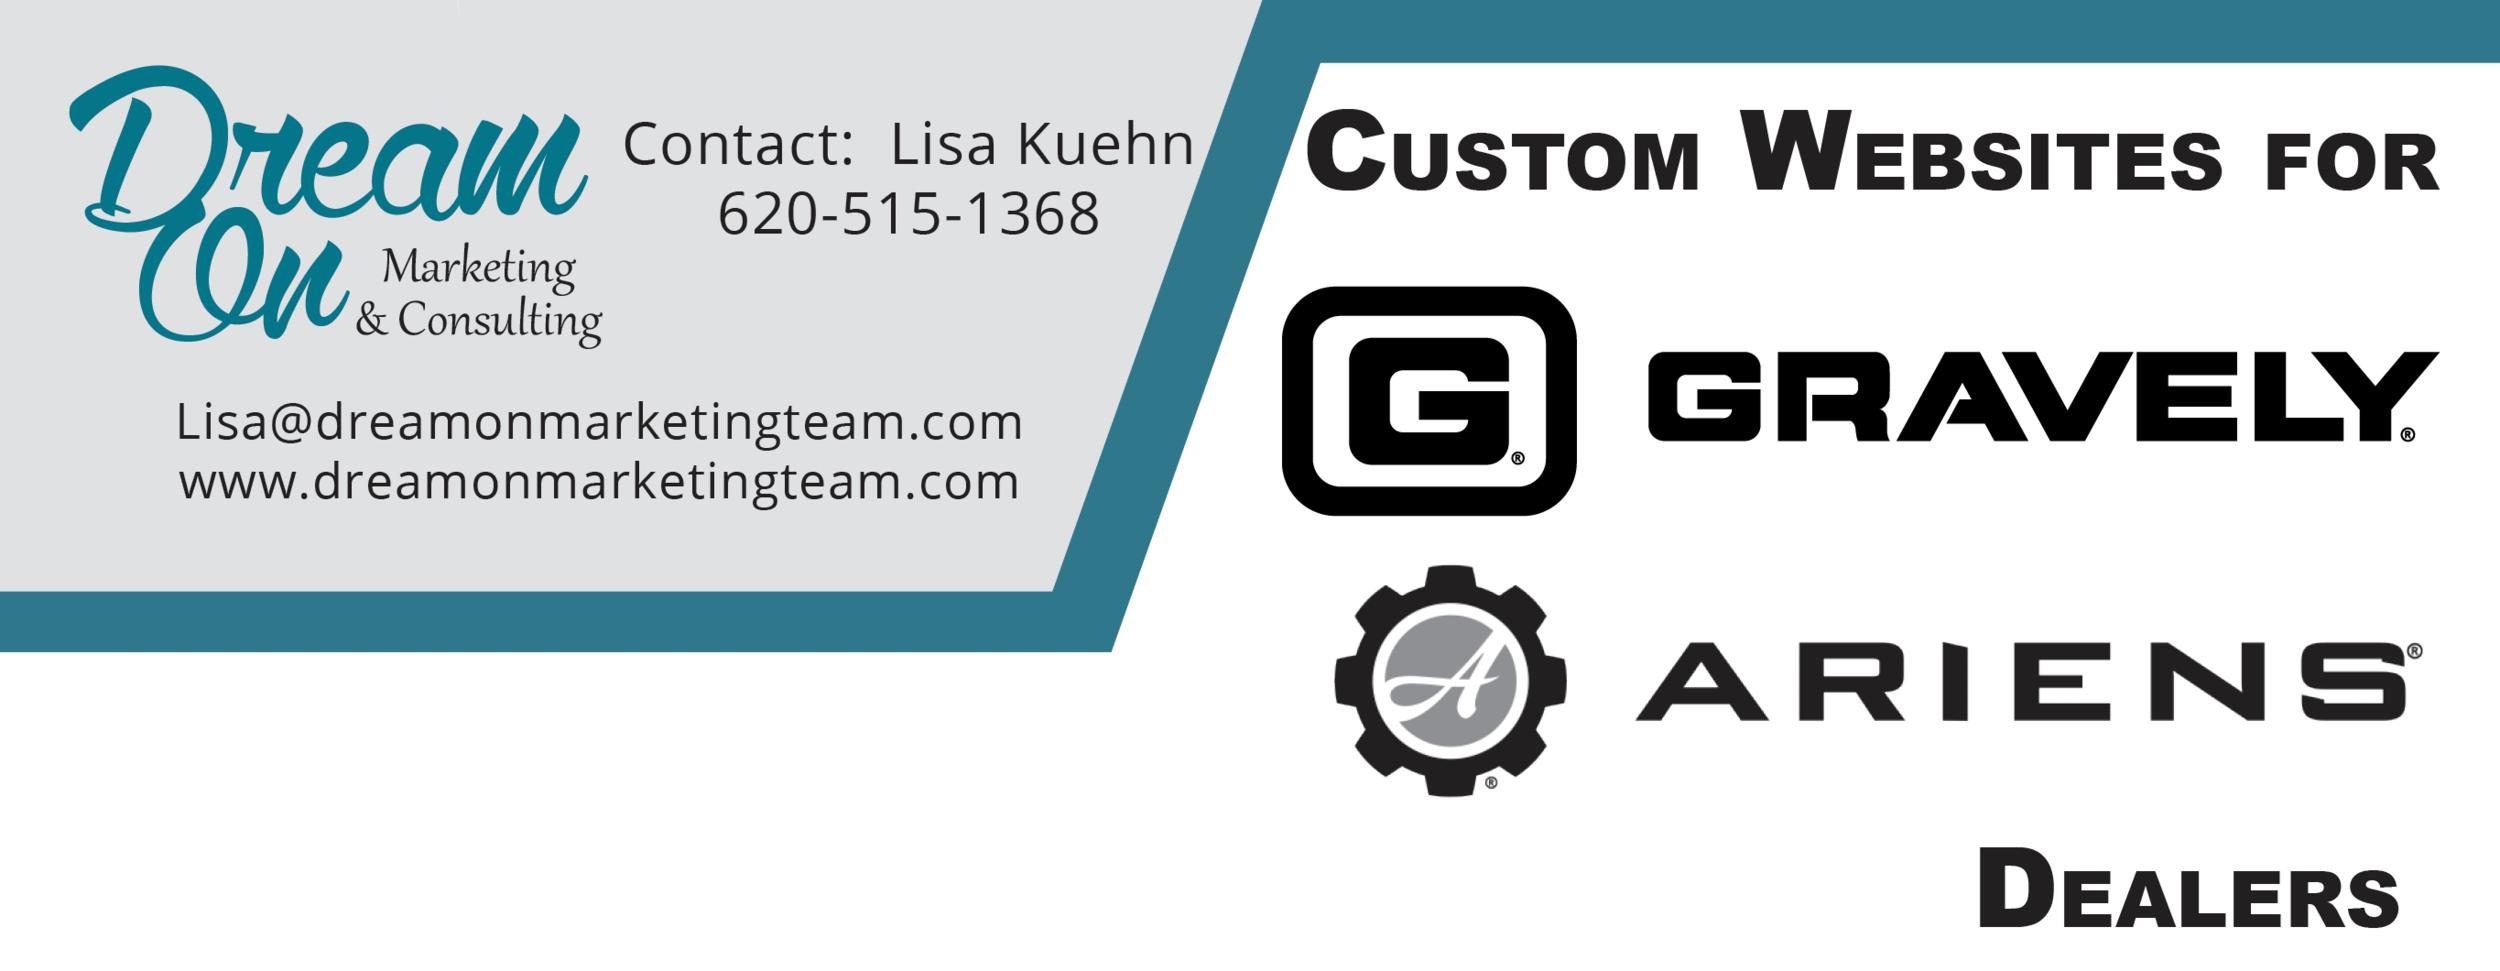 Gravely and Ariens Custom Websites